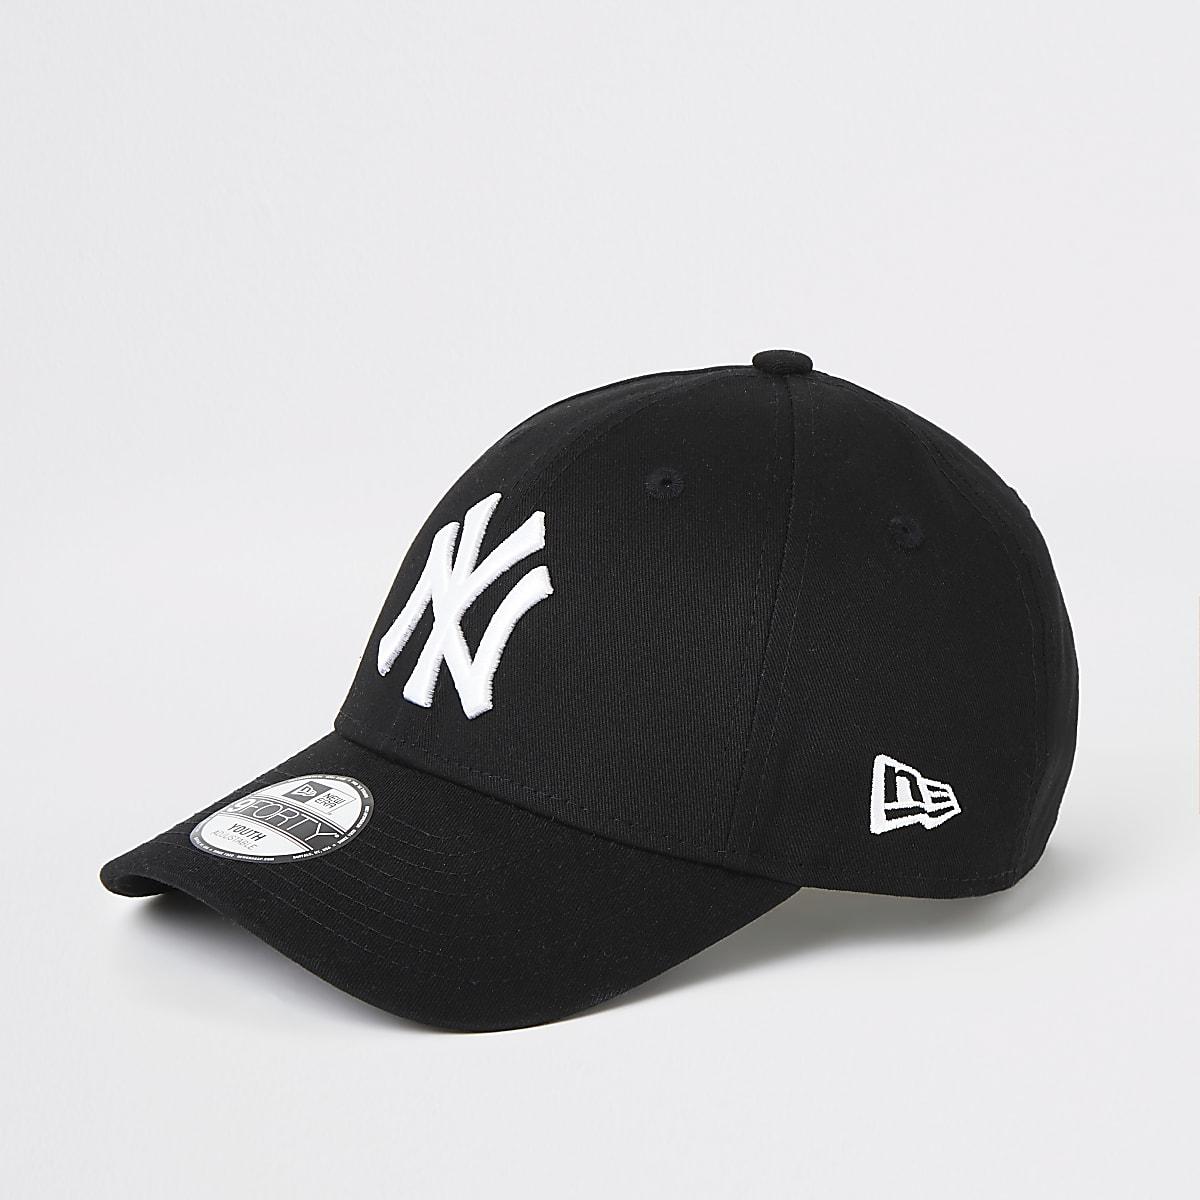 Boys black New Era NY curve peak cap